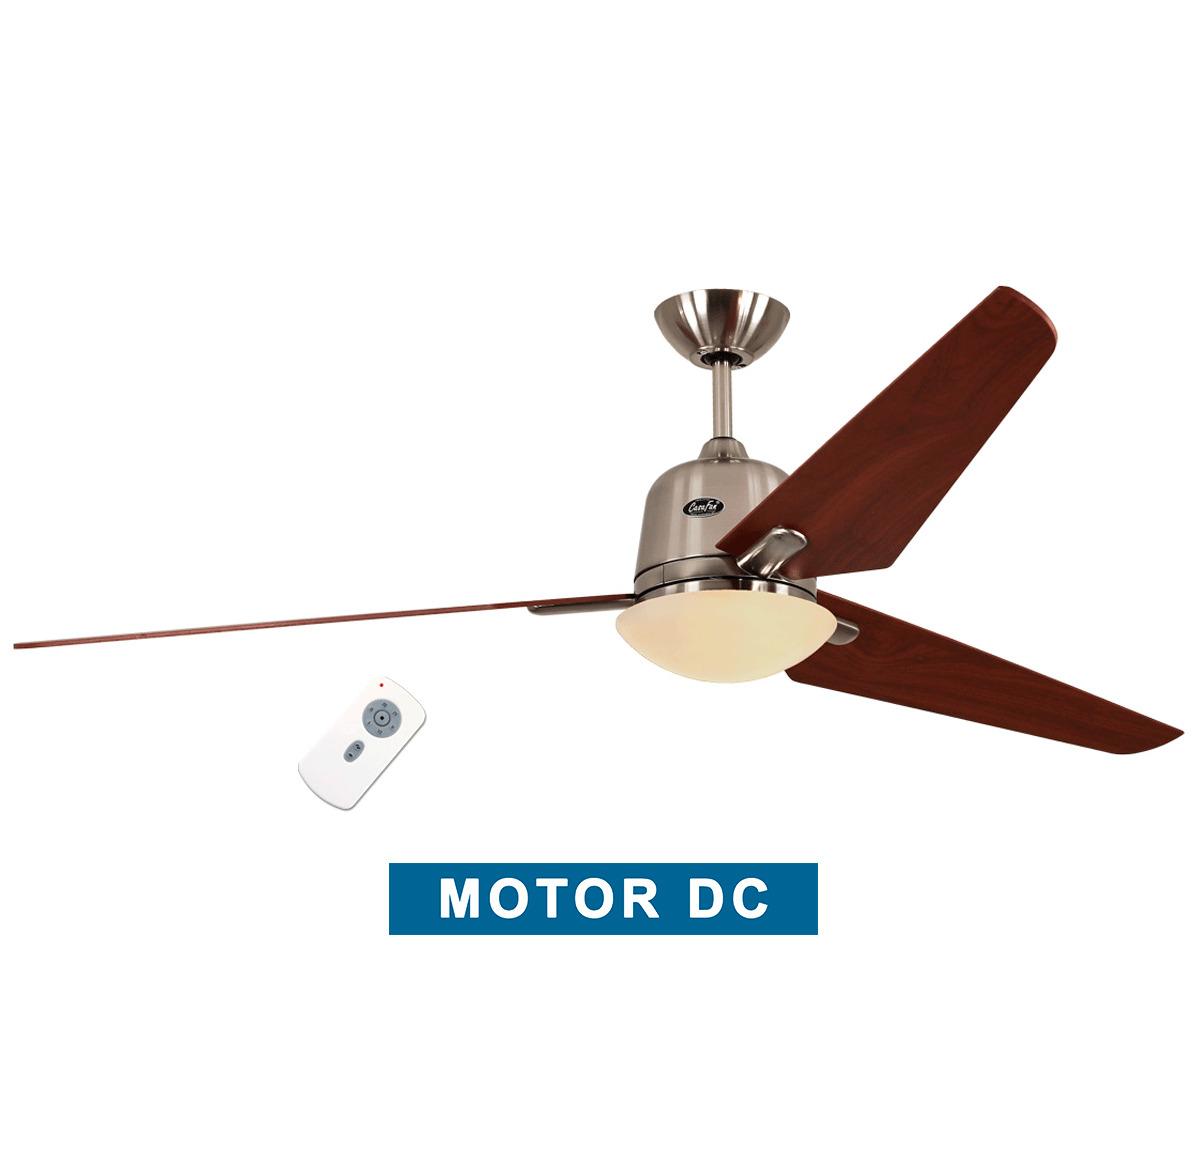 Ceiling fan with light CasaFan 516088 ECO AVIATOS 162 cherry / chrome...